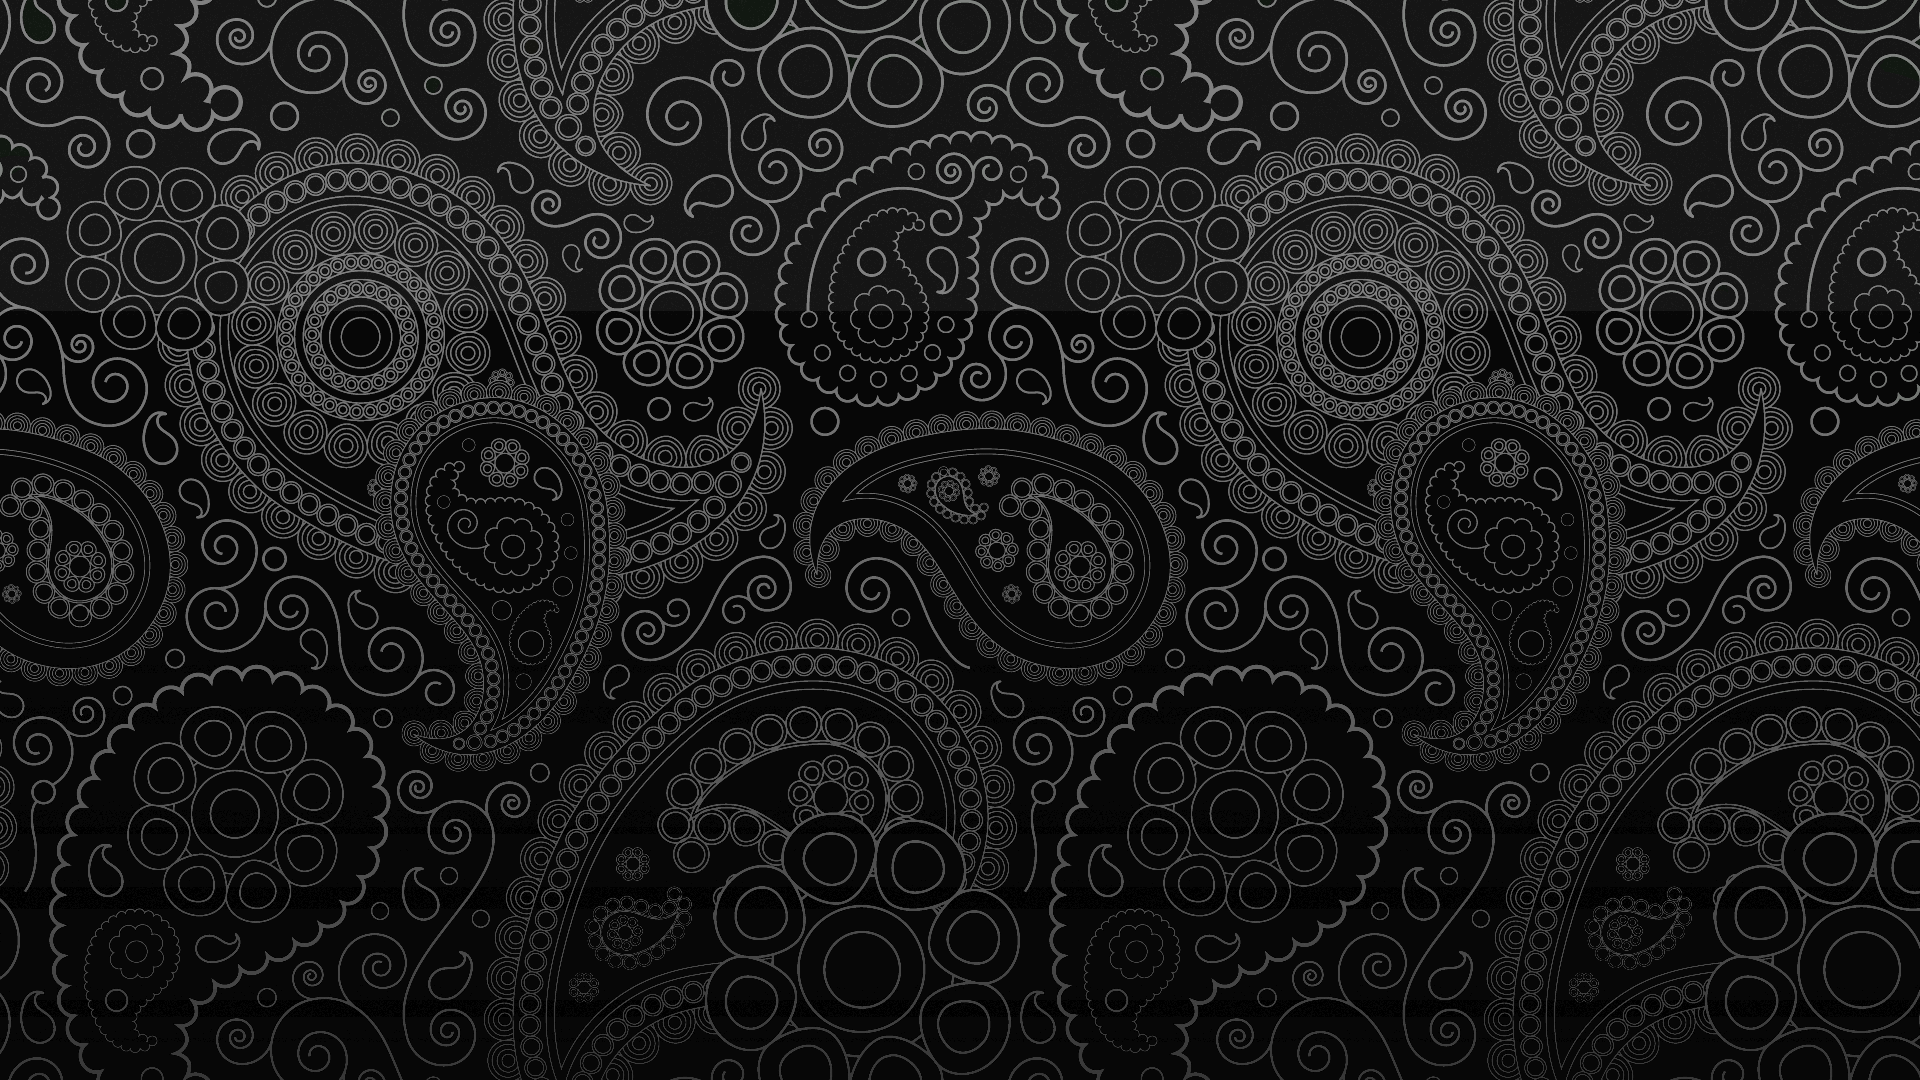 Wallpaper Pattern Hd Background Back Back It Up Black